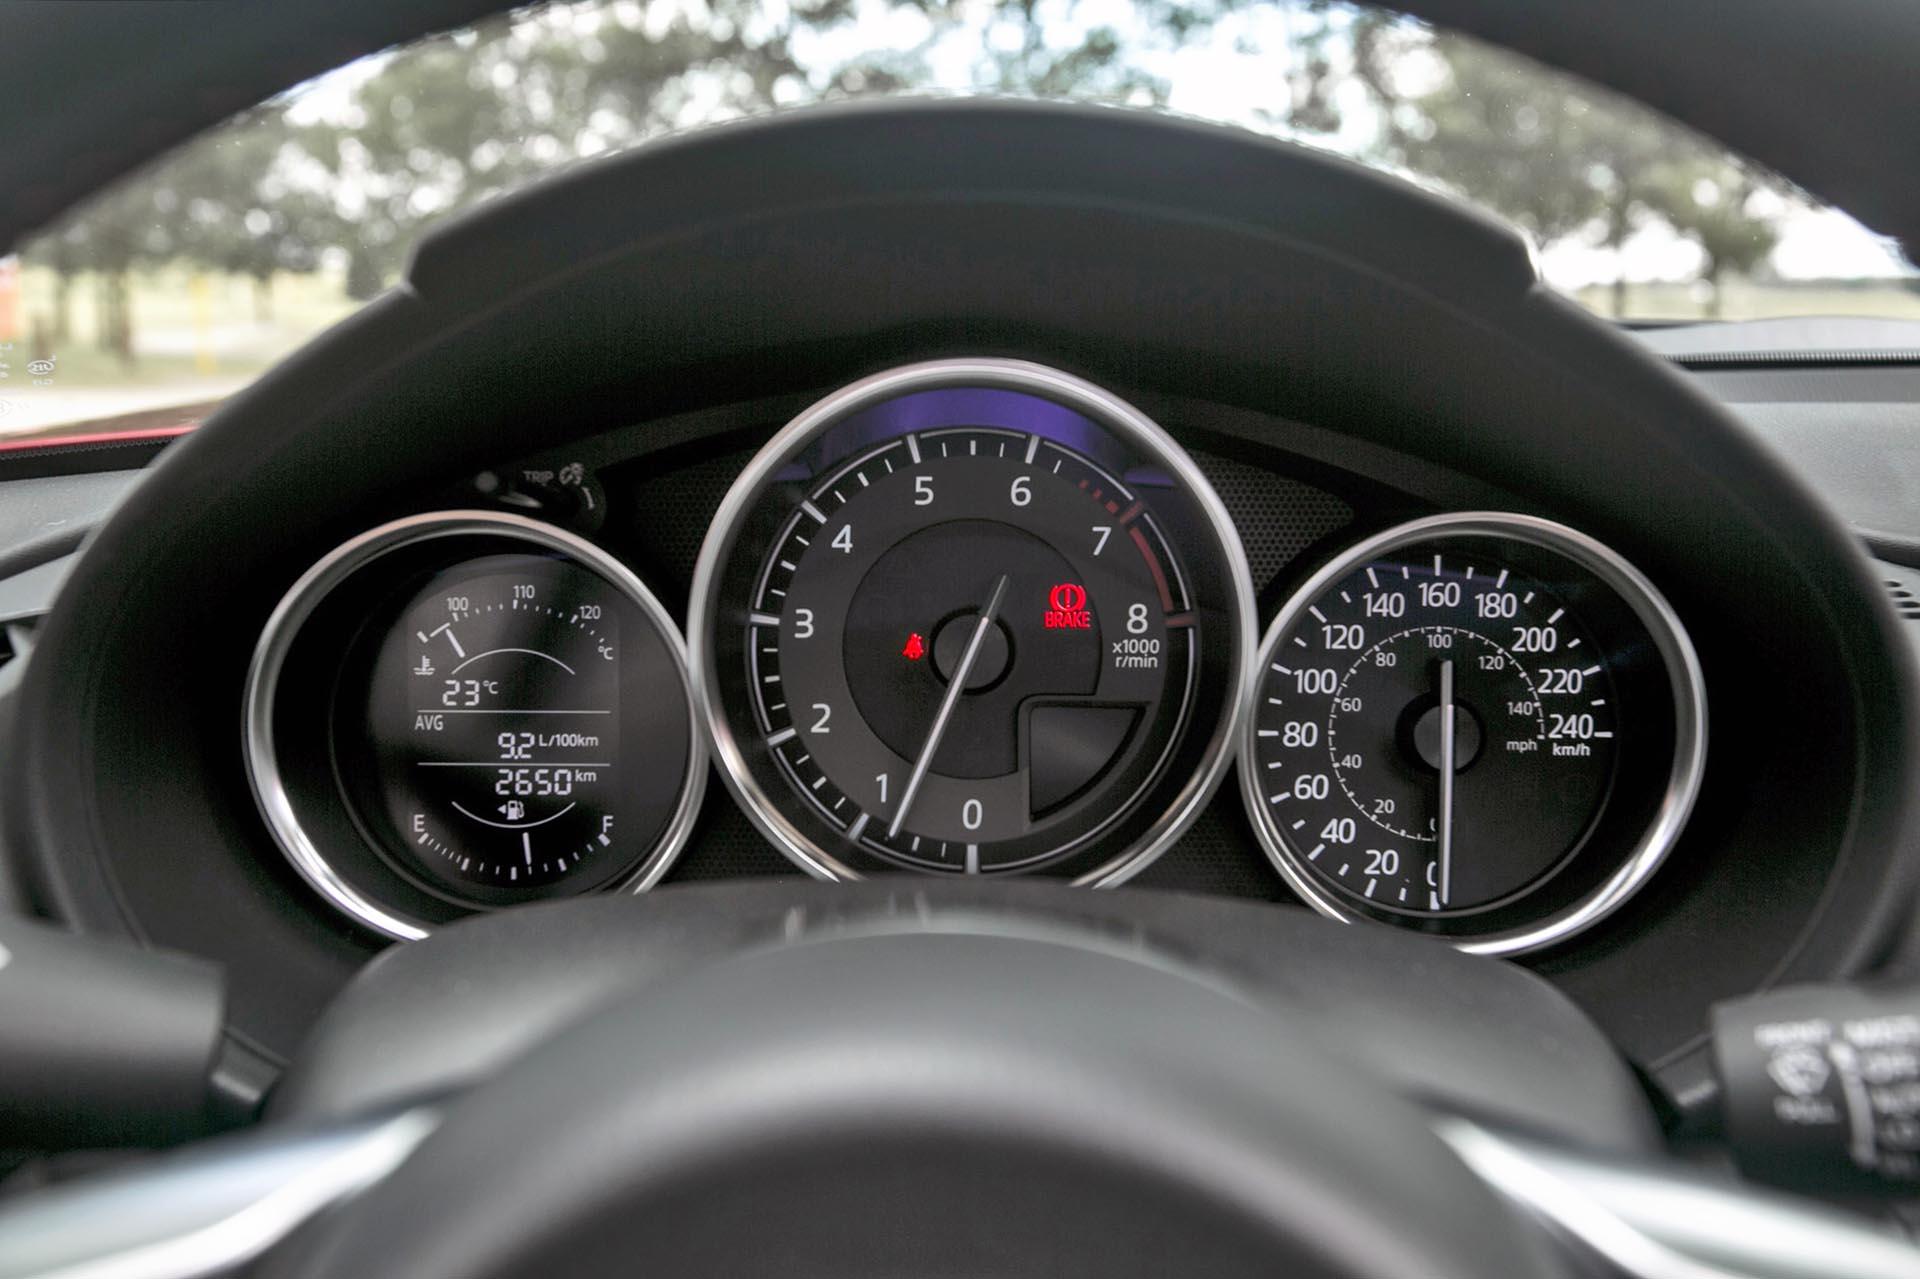 2016 Mazda MX-5 GS - Autos.ca